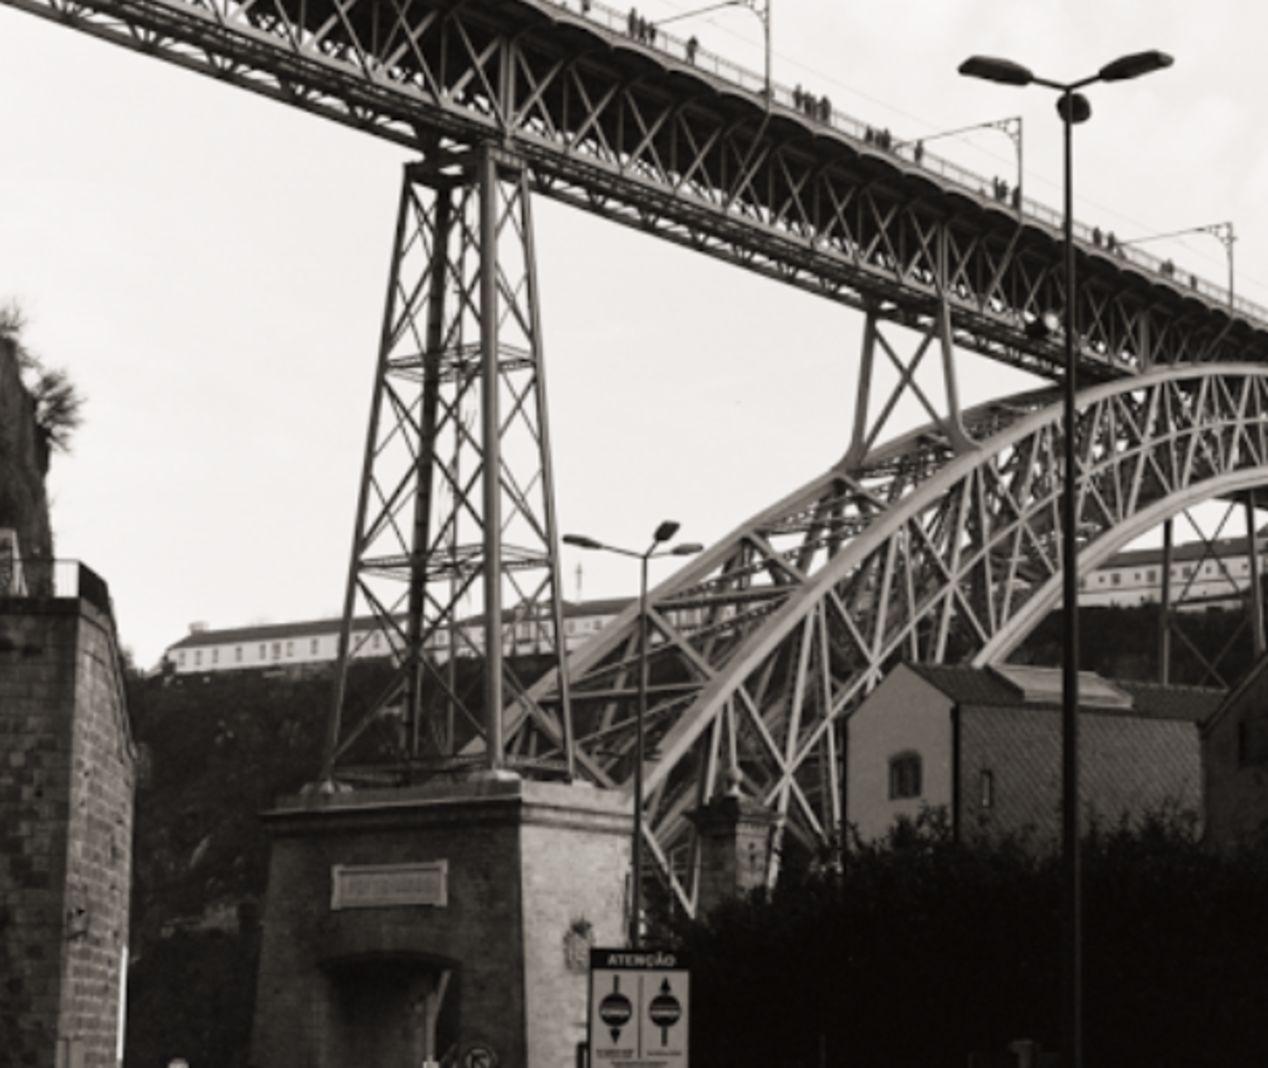 Ponte D. Luís I. Olympus OM-10, 50mm.